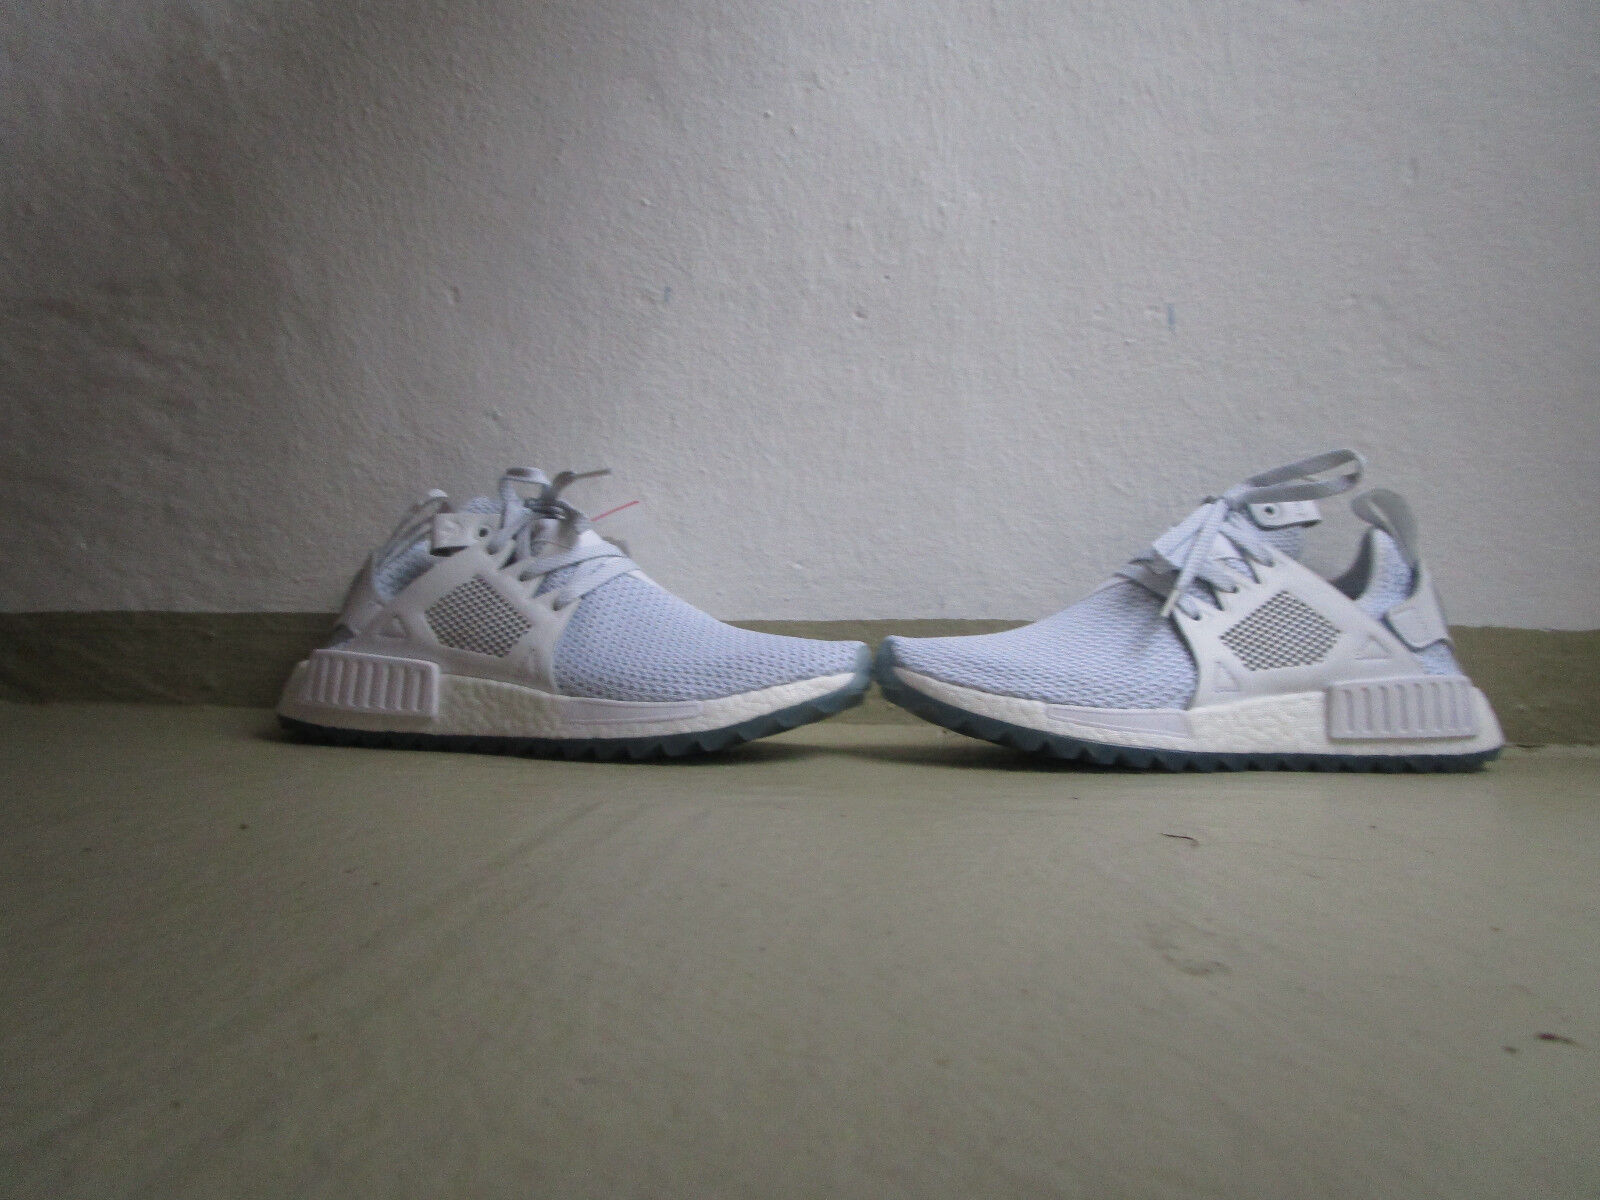 Adidas Consortium x Titolo NMD XR1 Trail Runner Boost Boost Boost 45 1/3 Light bleu/blanc 870ac5